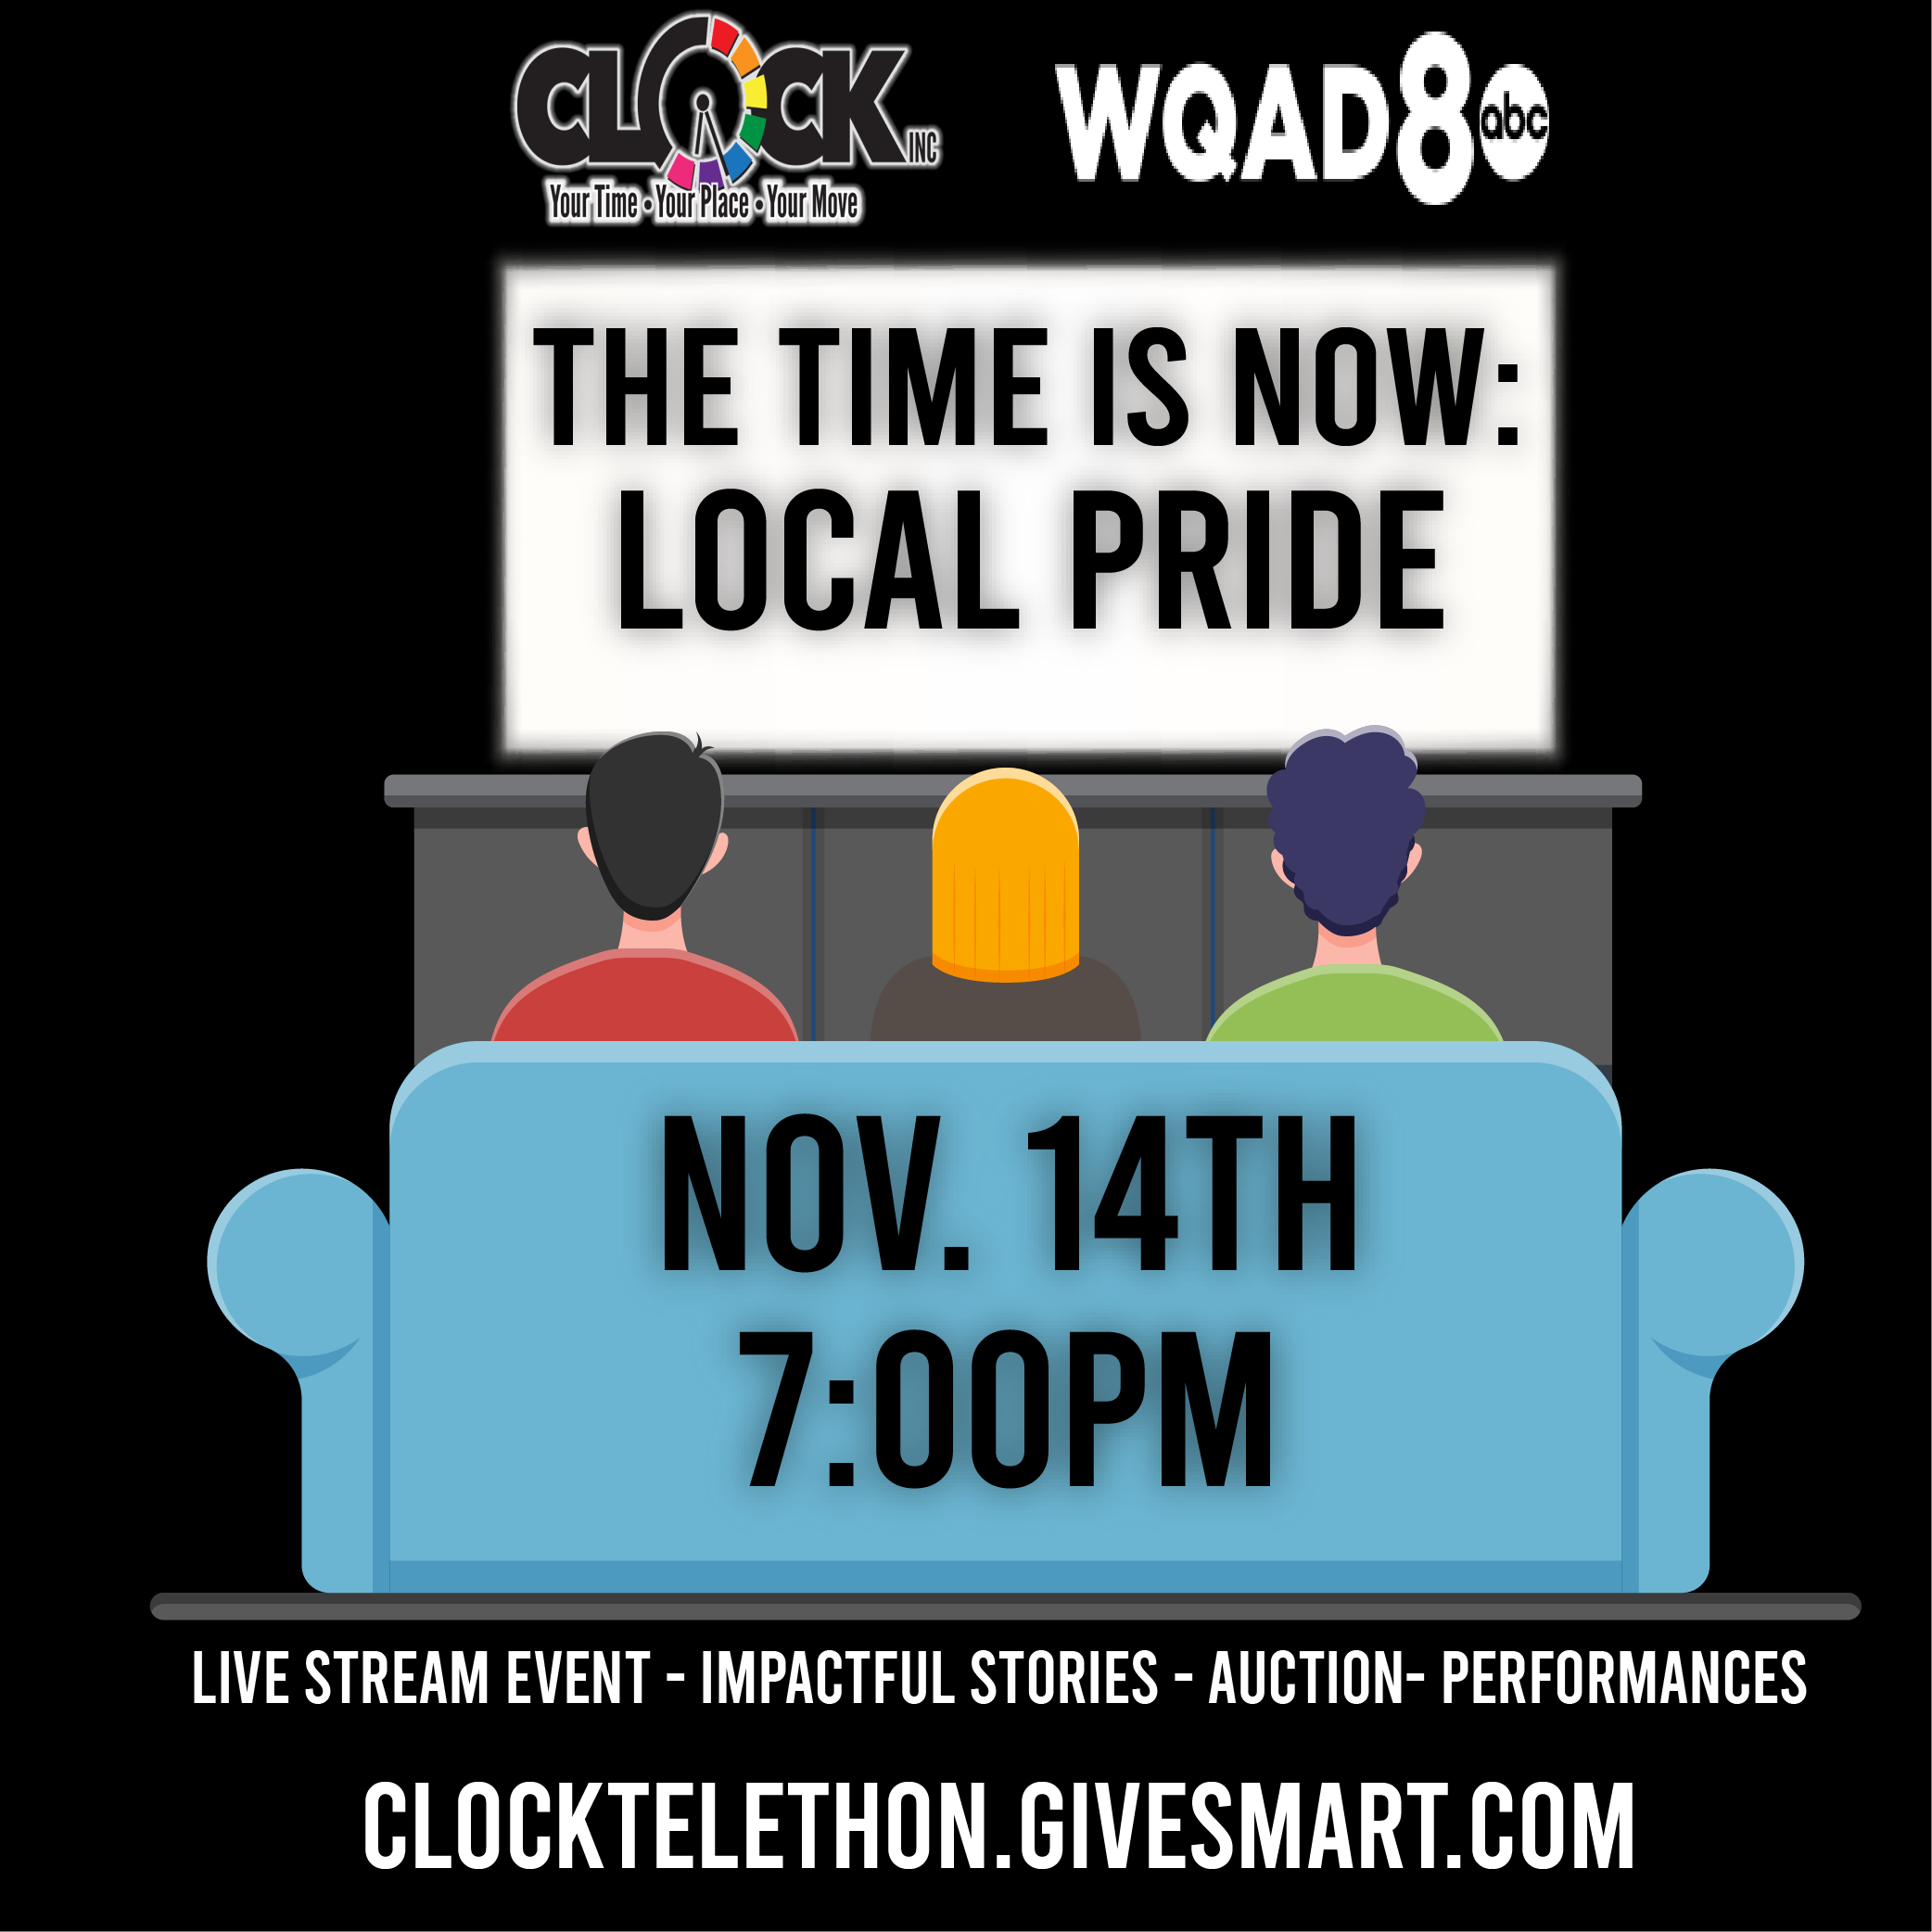 Local Pride for Clock Inc